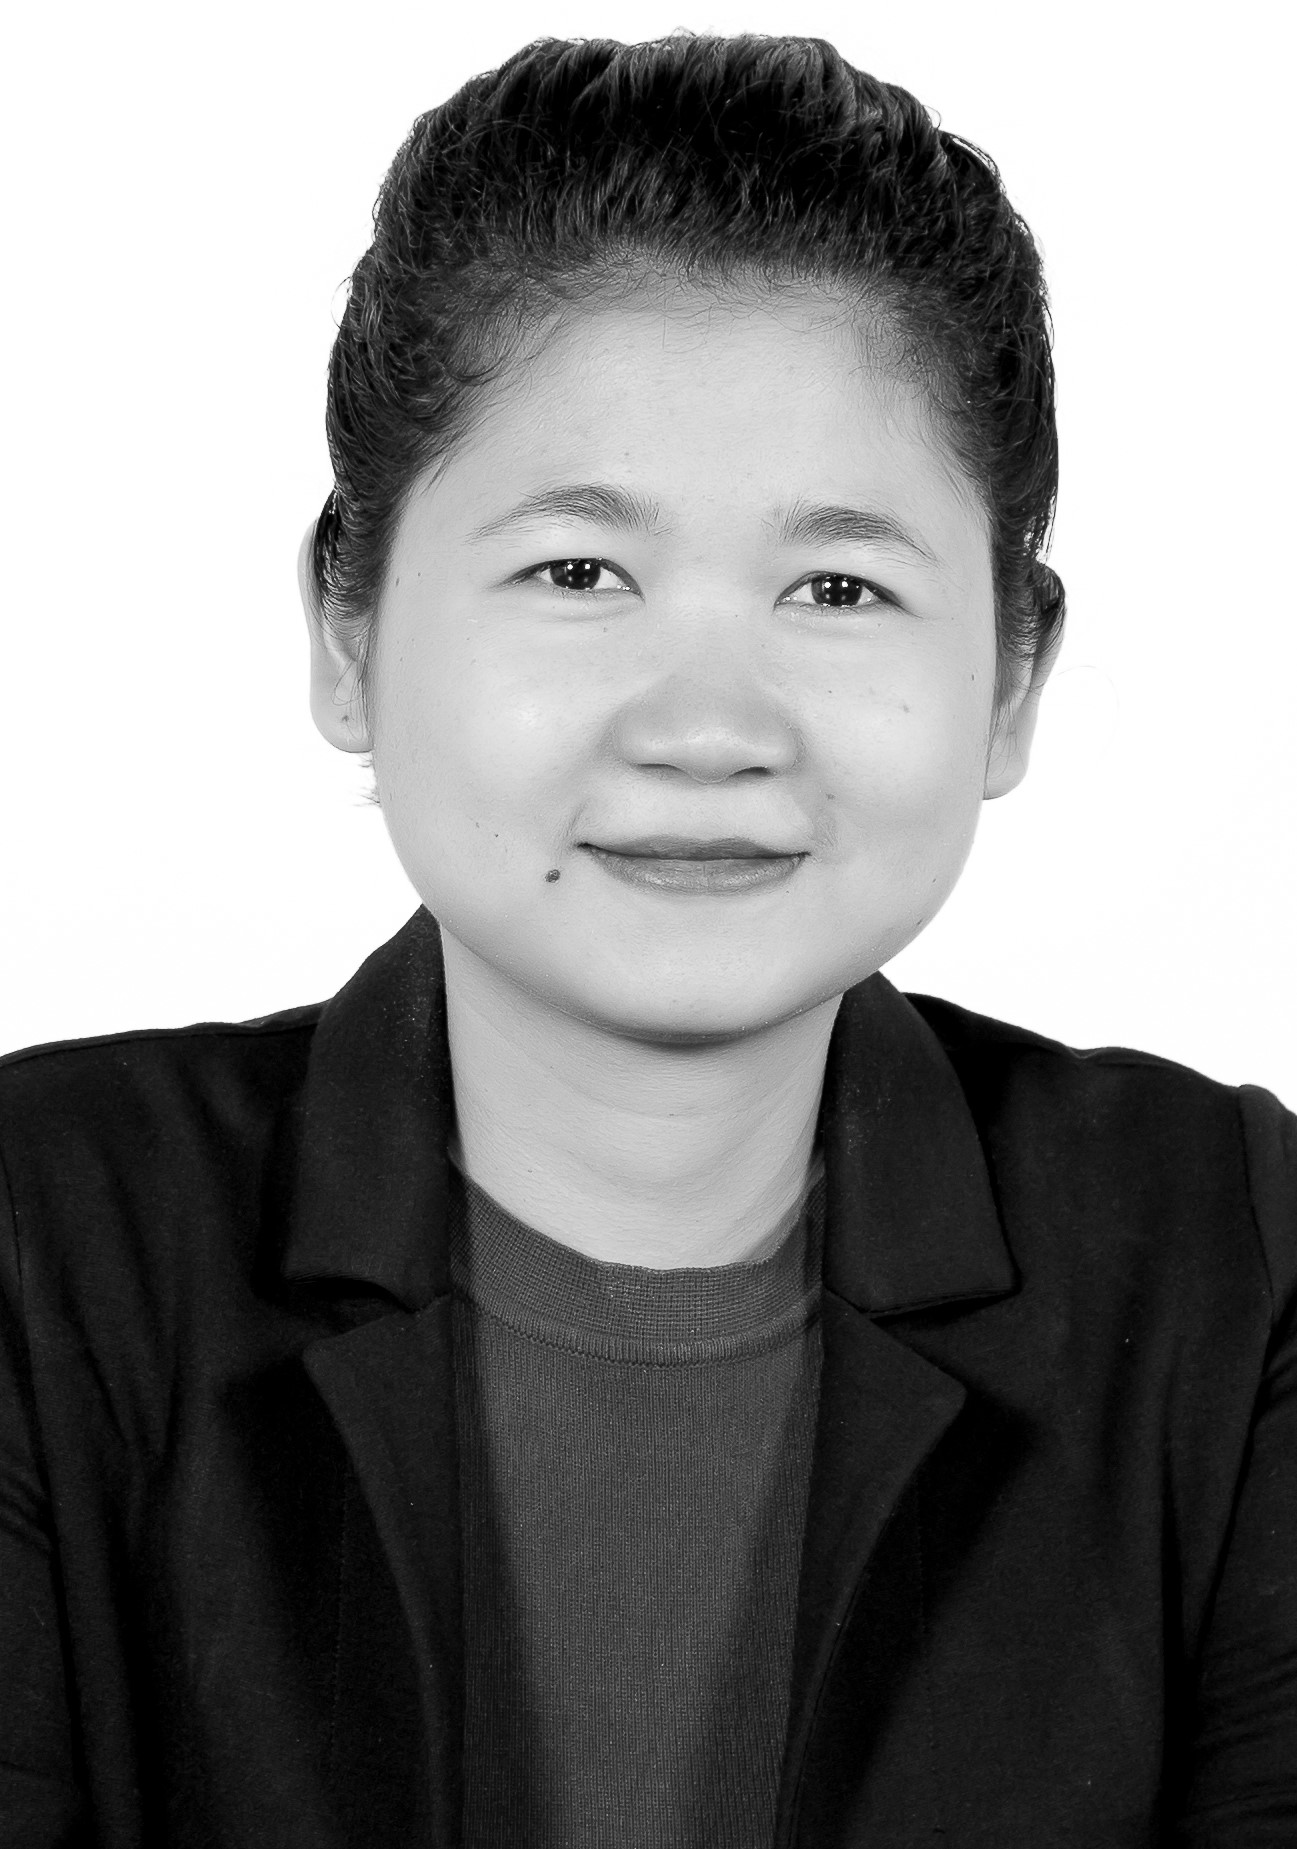 Mya Thita Oo